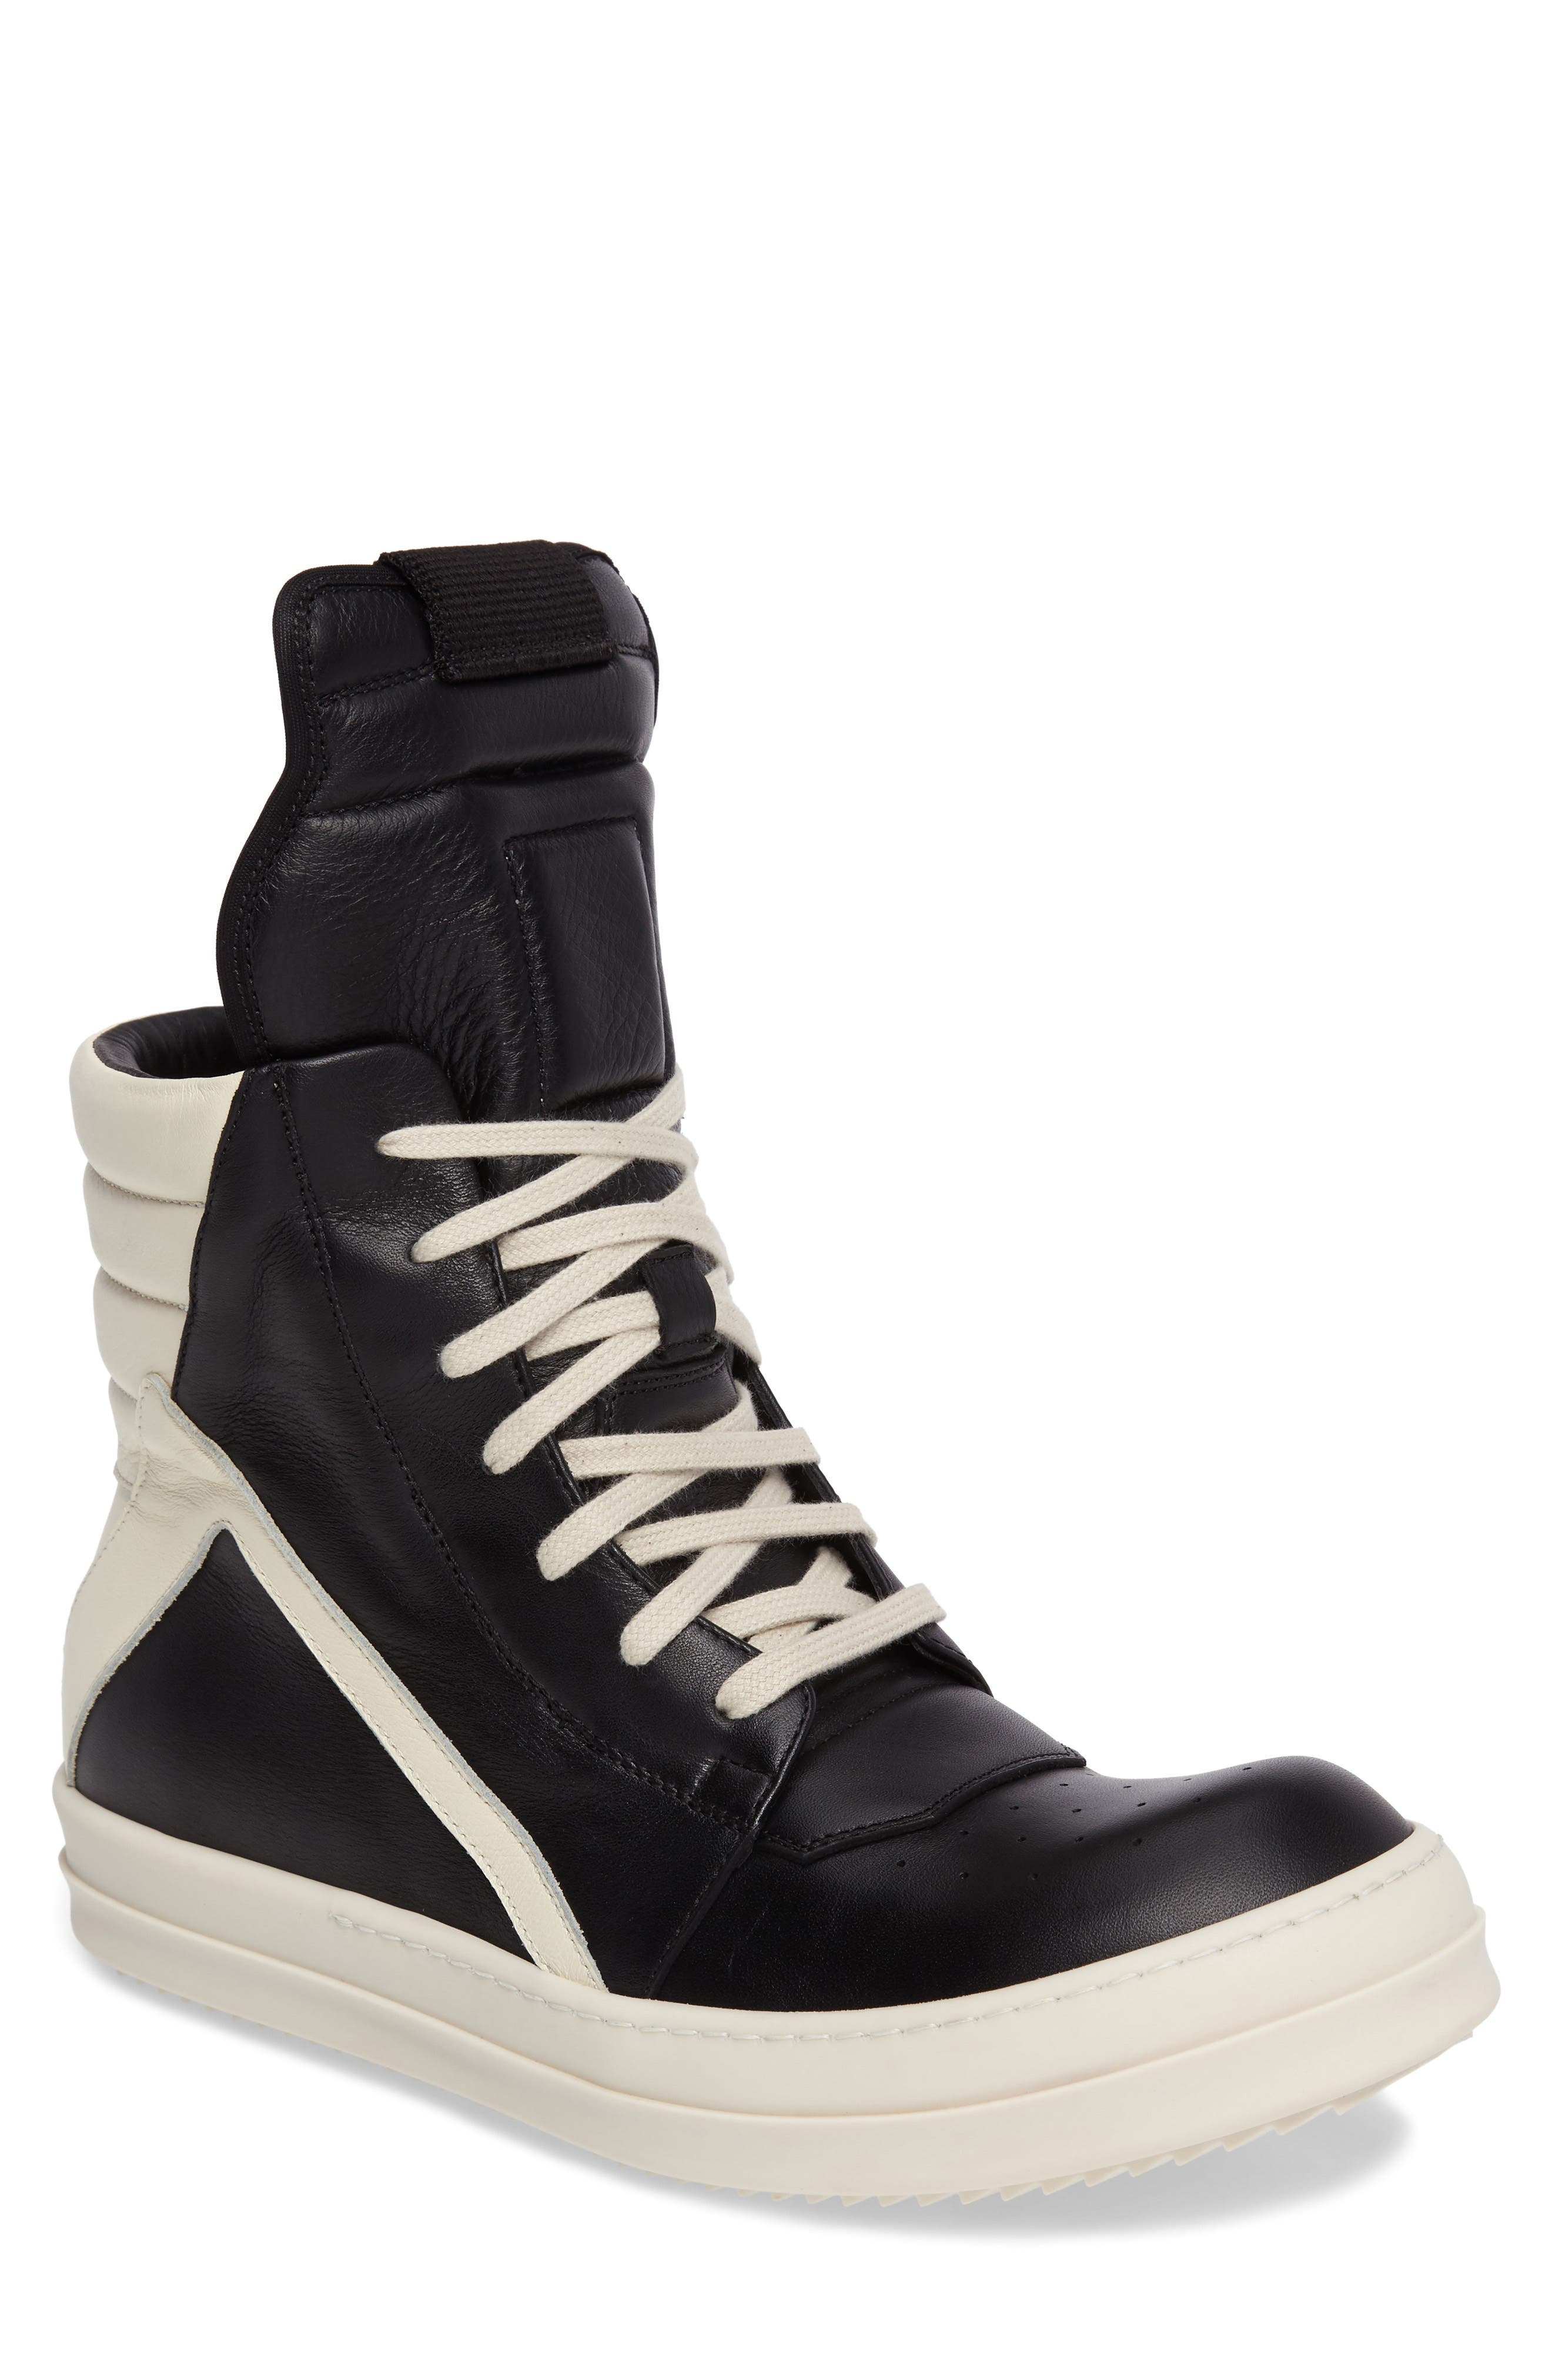 'Geobasket' High Top Sneaker,                         Main,                         color, 001